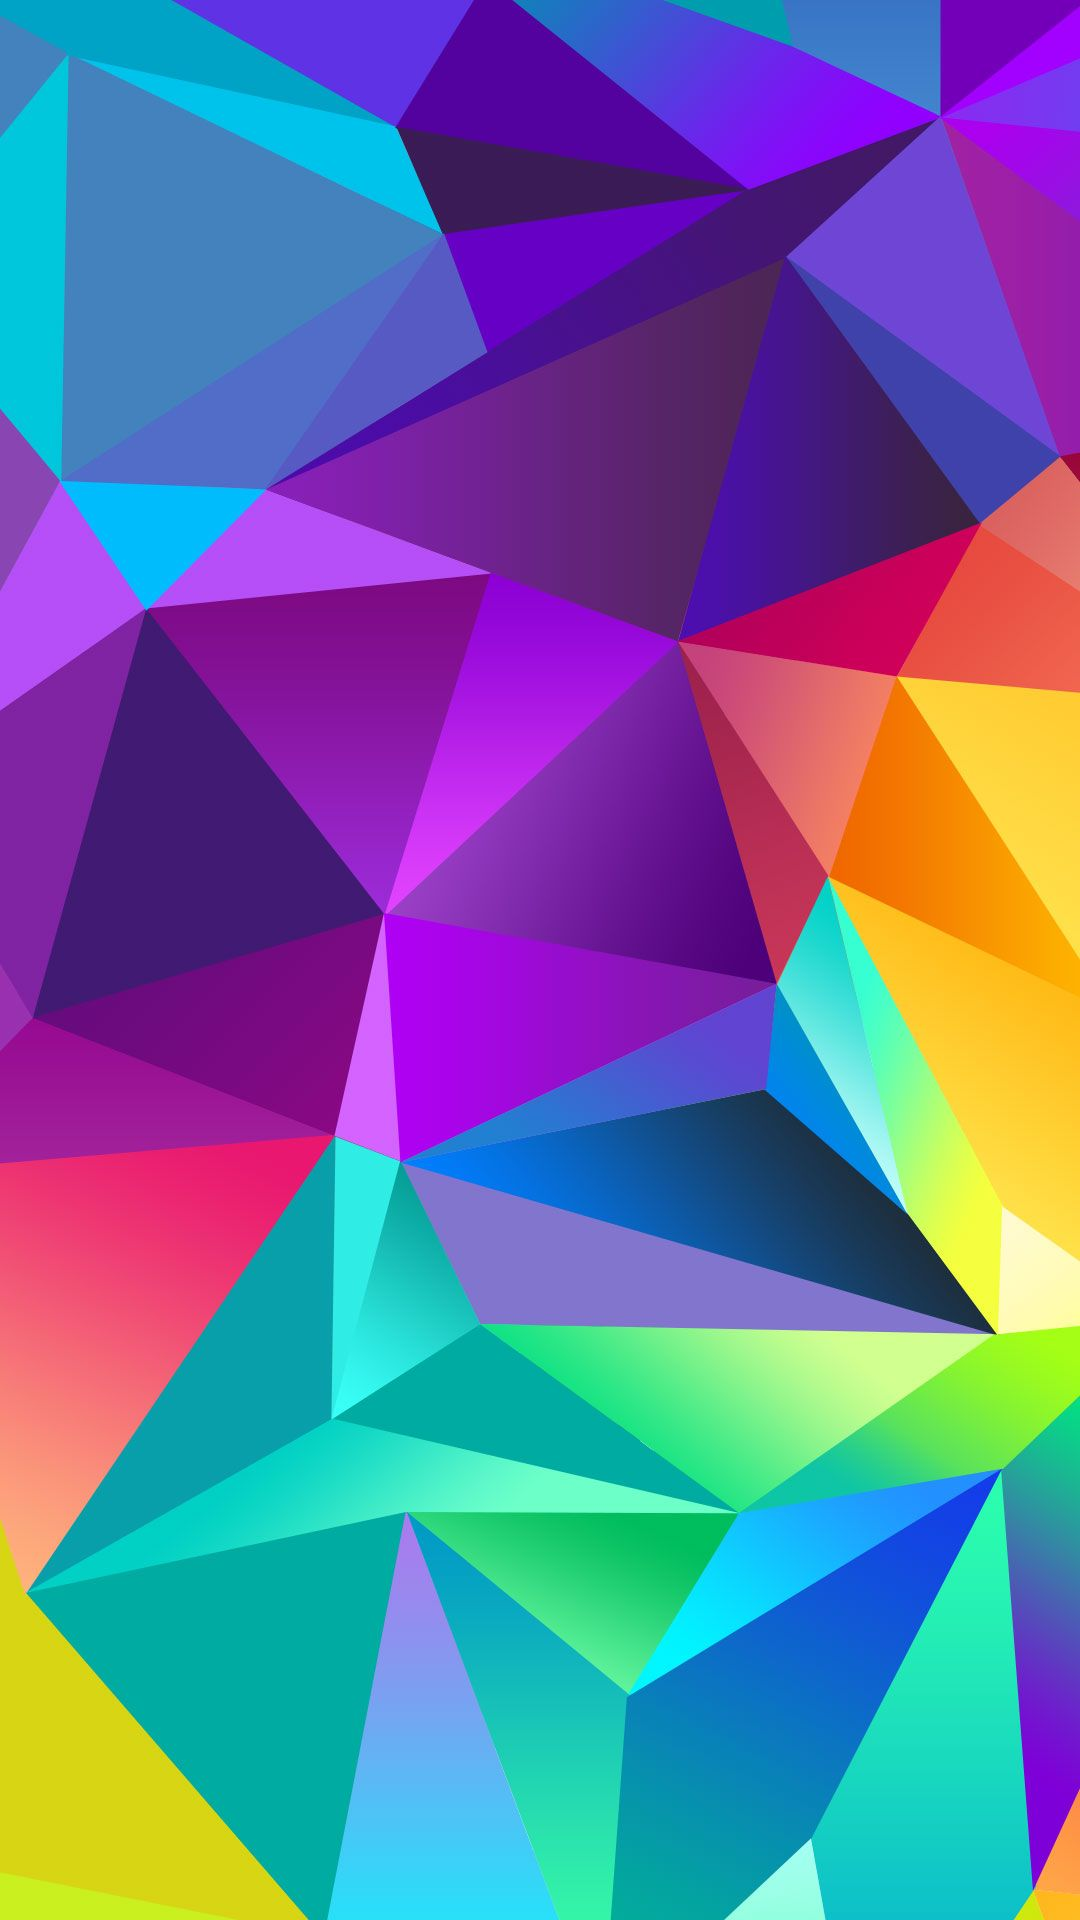 ☺iphone ios 7 wallpaper tumblr for ipad Iphone 6 plus